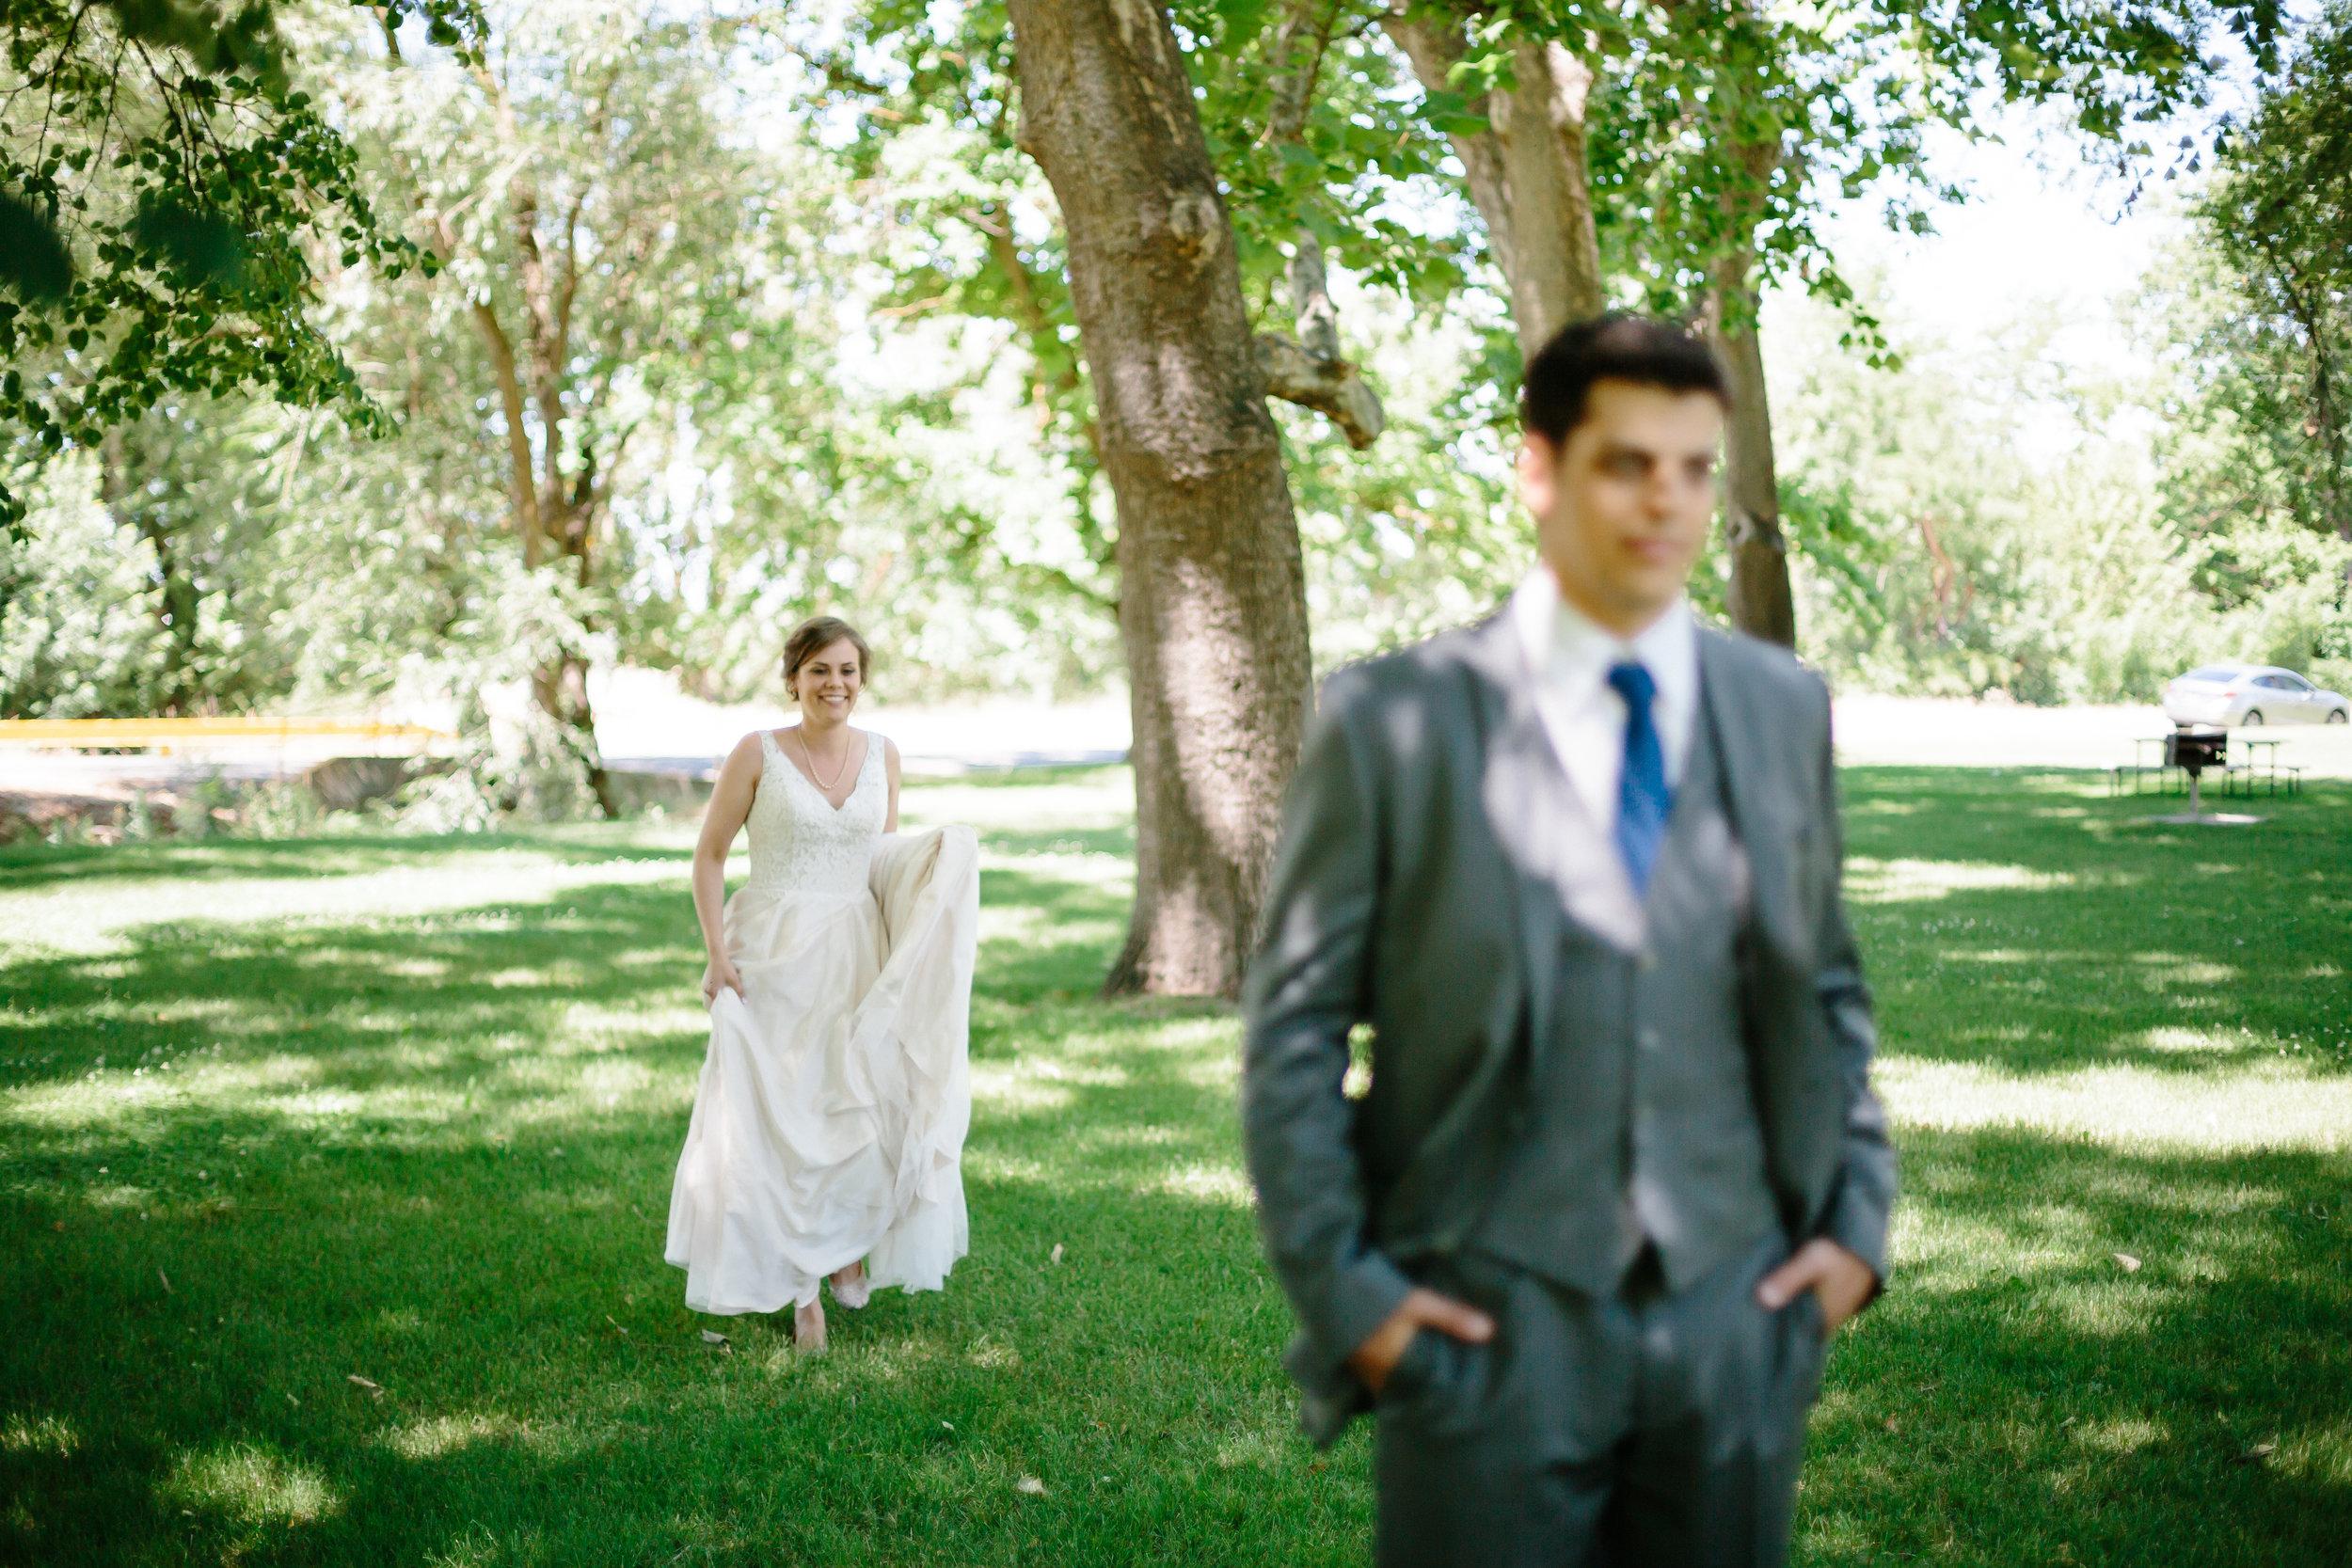 Jordan & Shantel Married - Idaho - Corrie Mick Photography-69.jpg